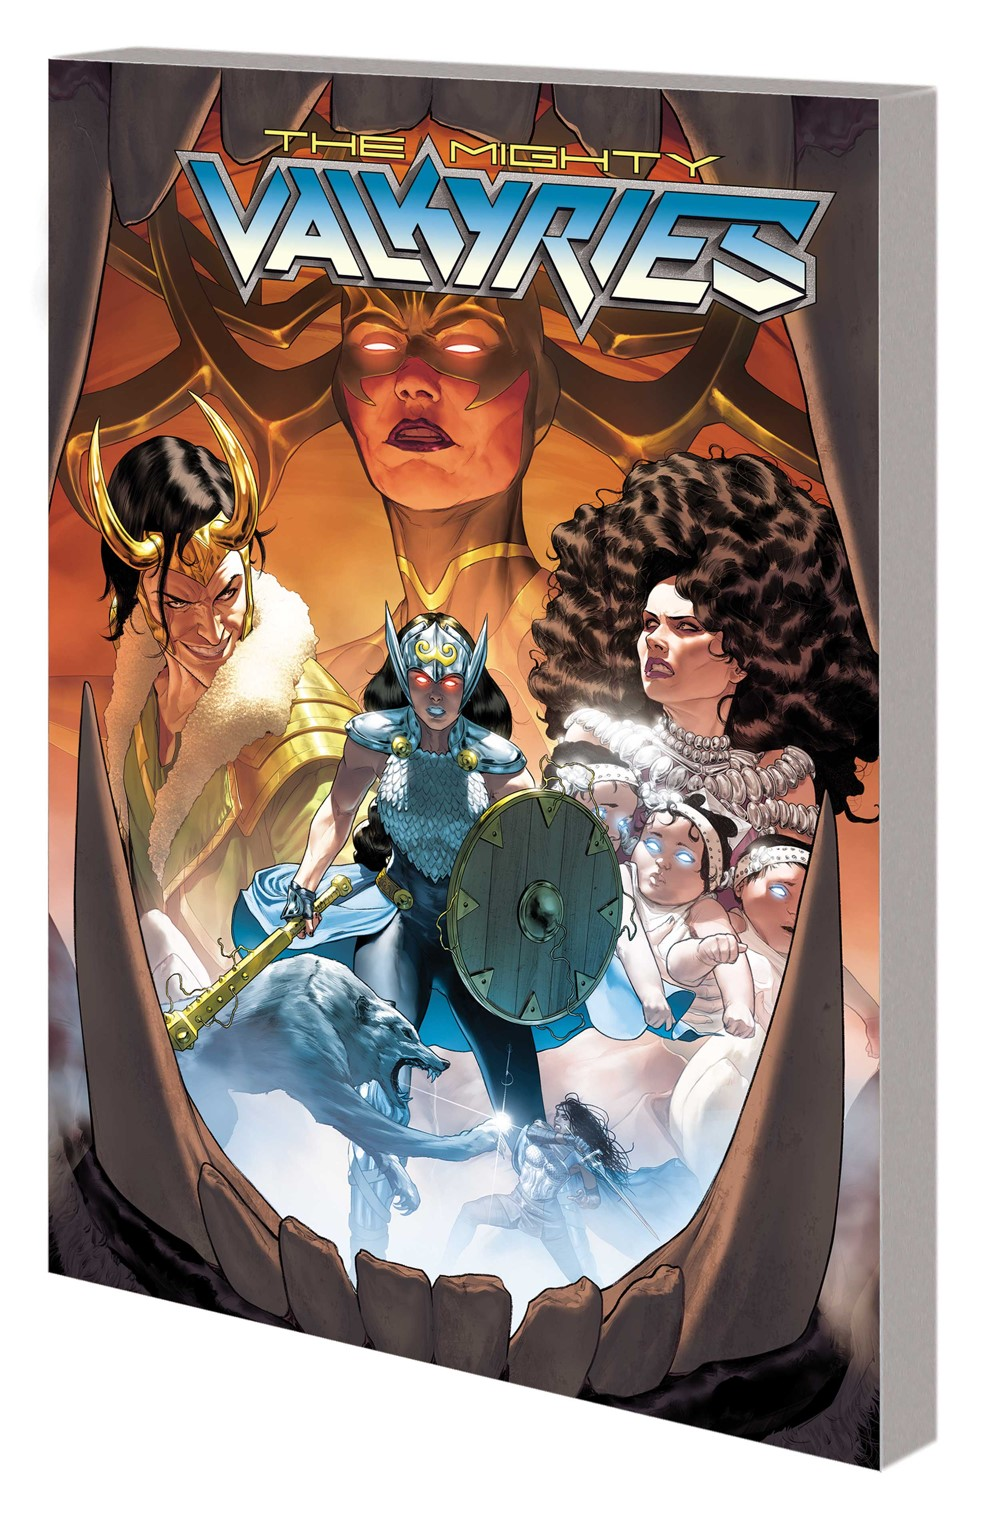 MIGHTYVALKYRIES_TPB Marvel Comics September 2021 Solicitations